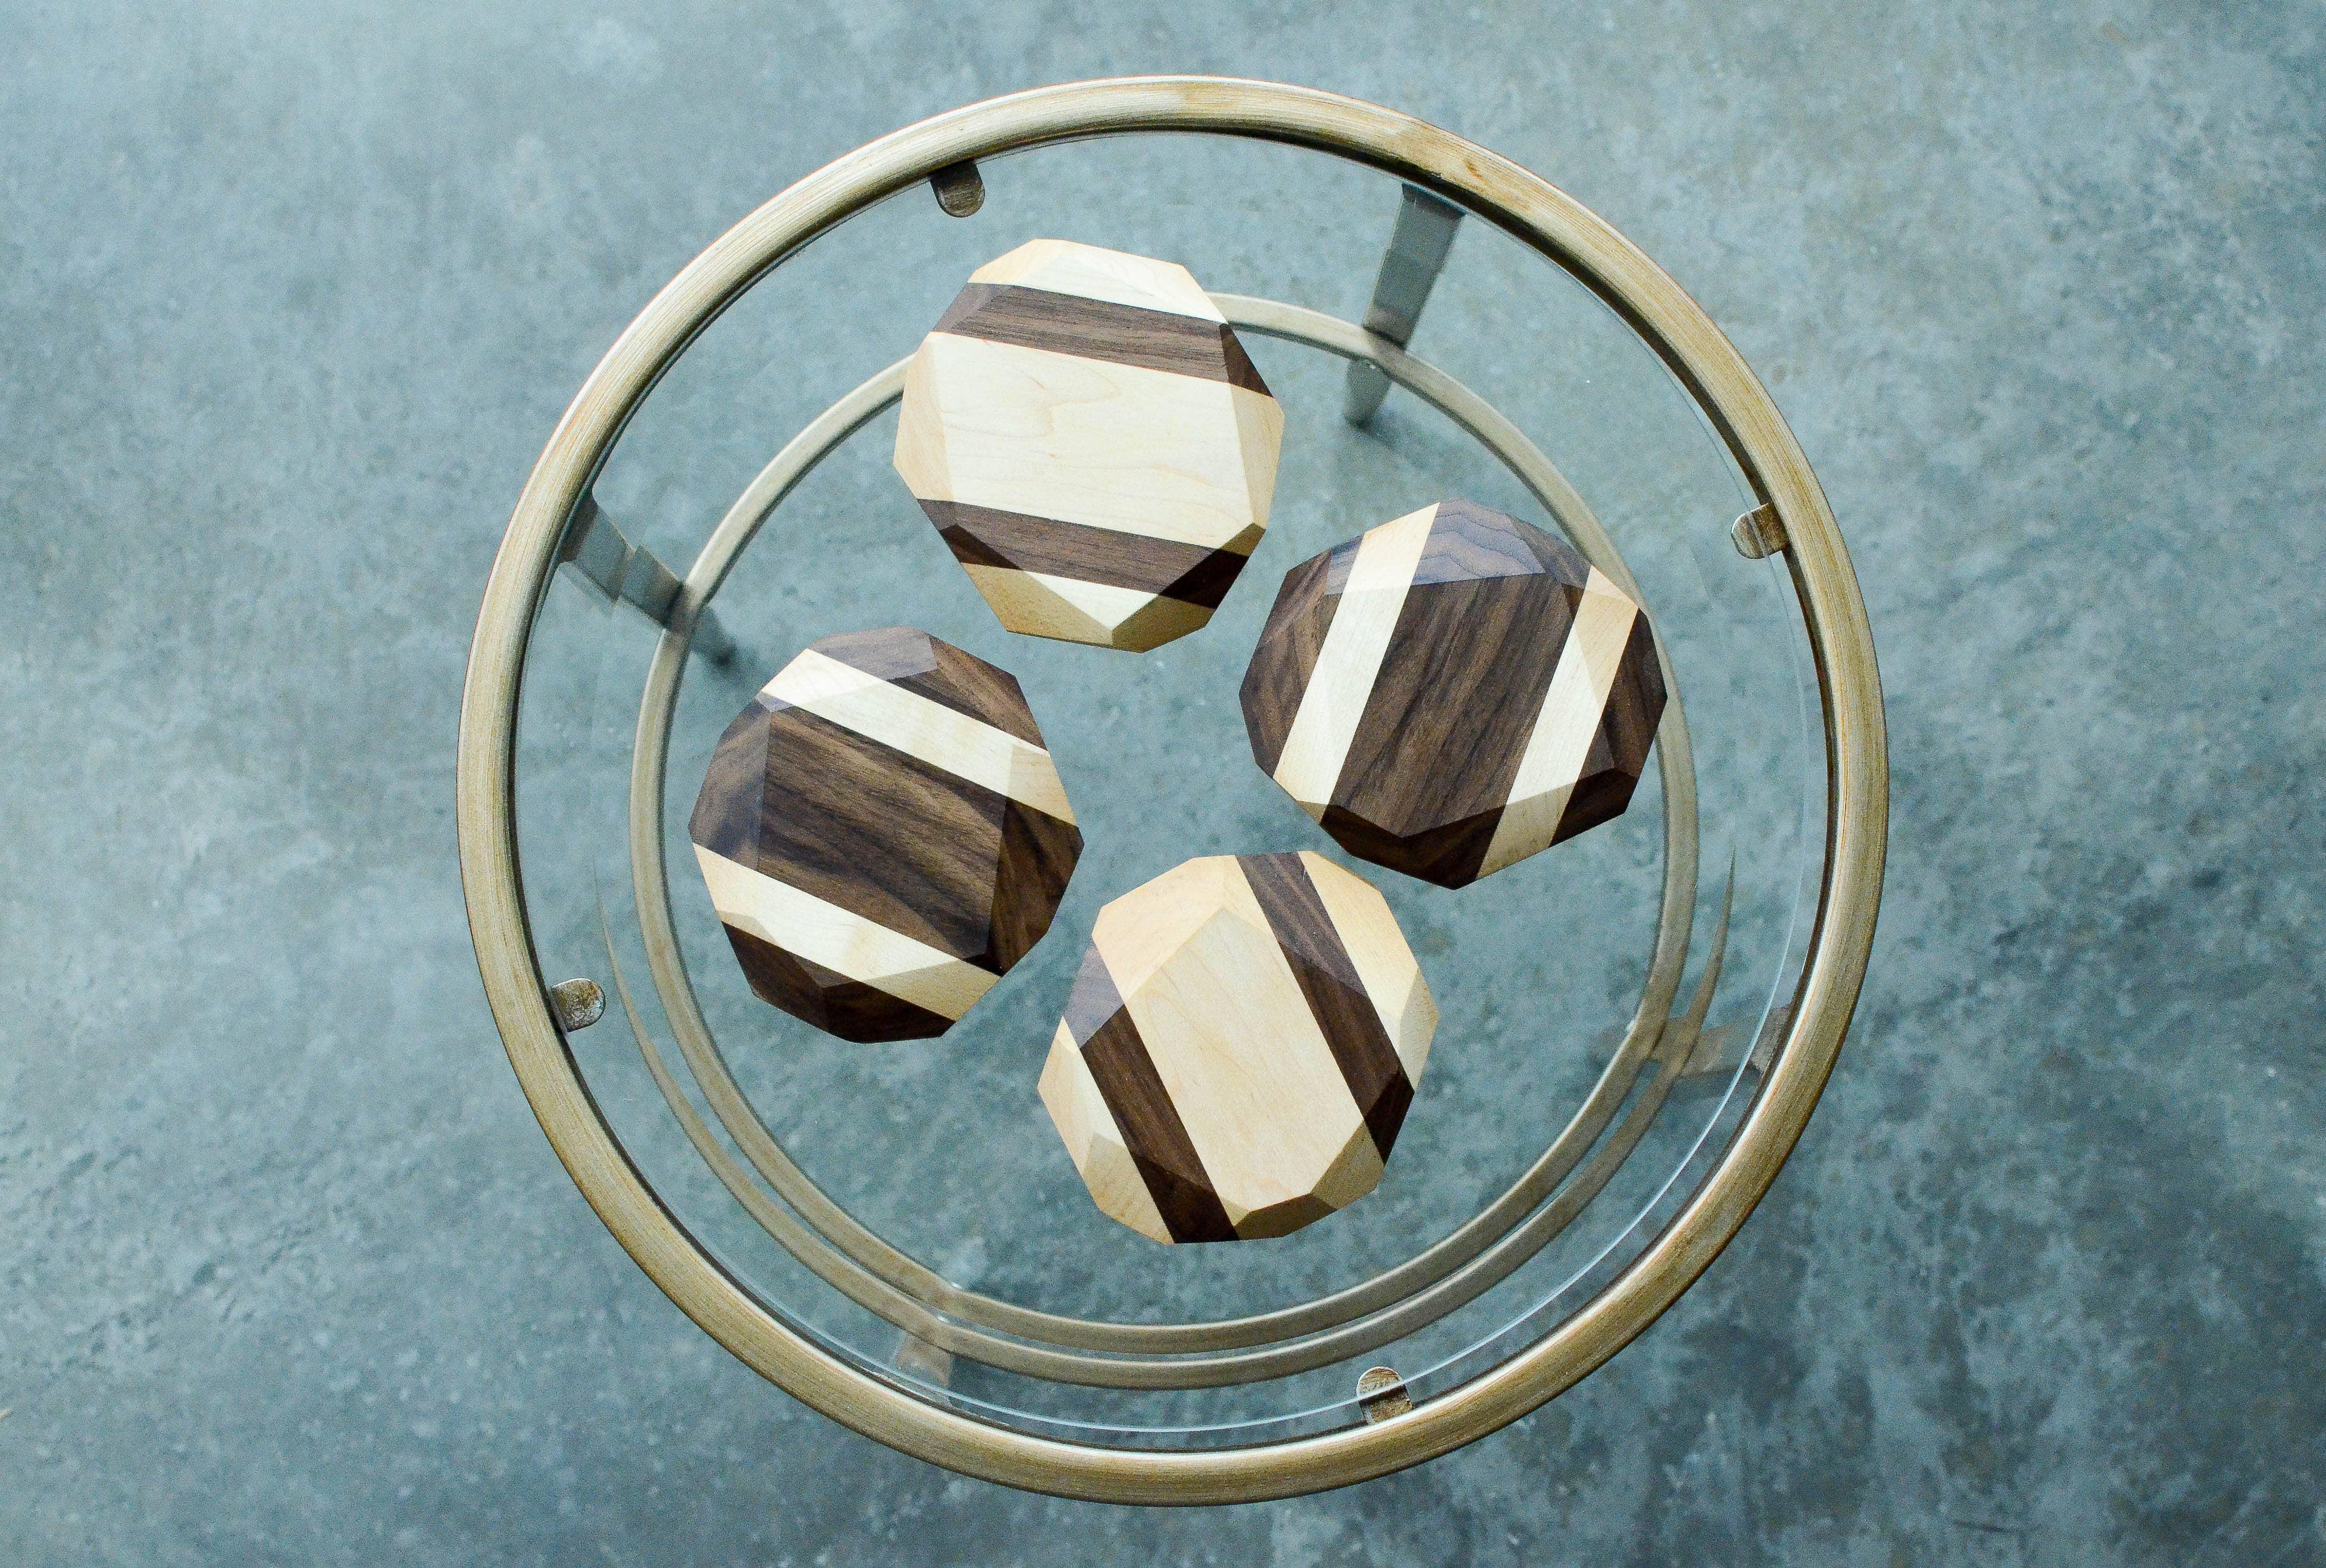 Wooden Geometric Coasters (Set of 4) | Trada Marketplace